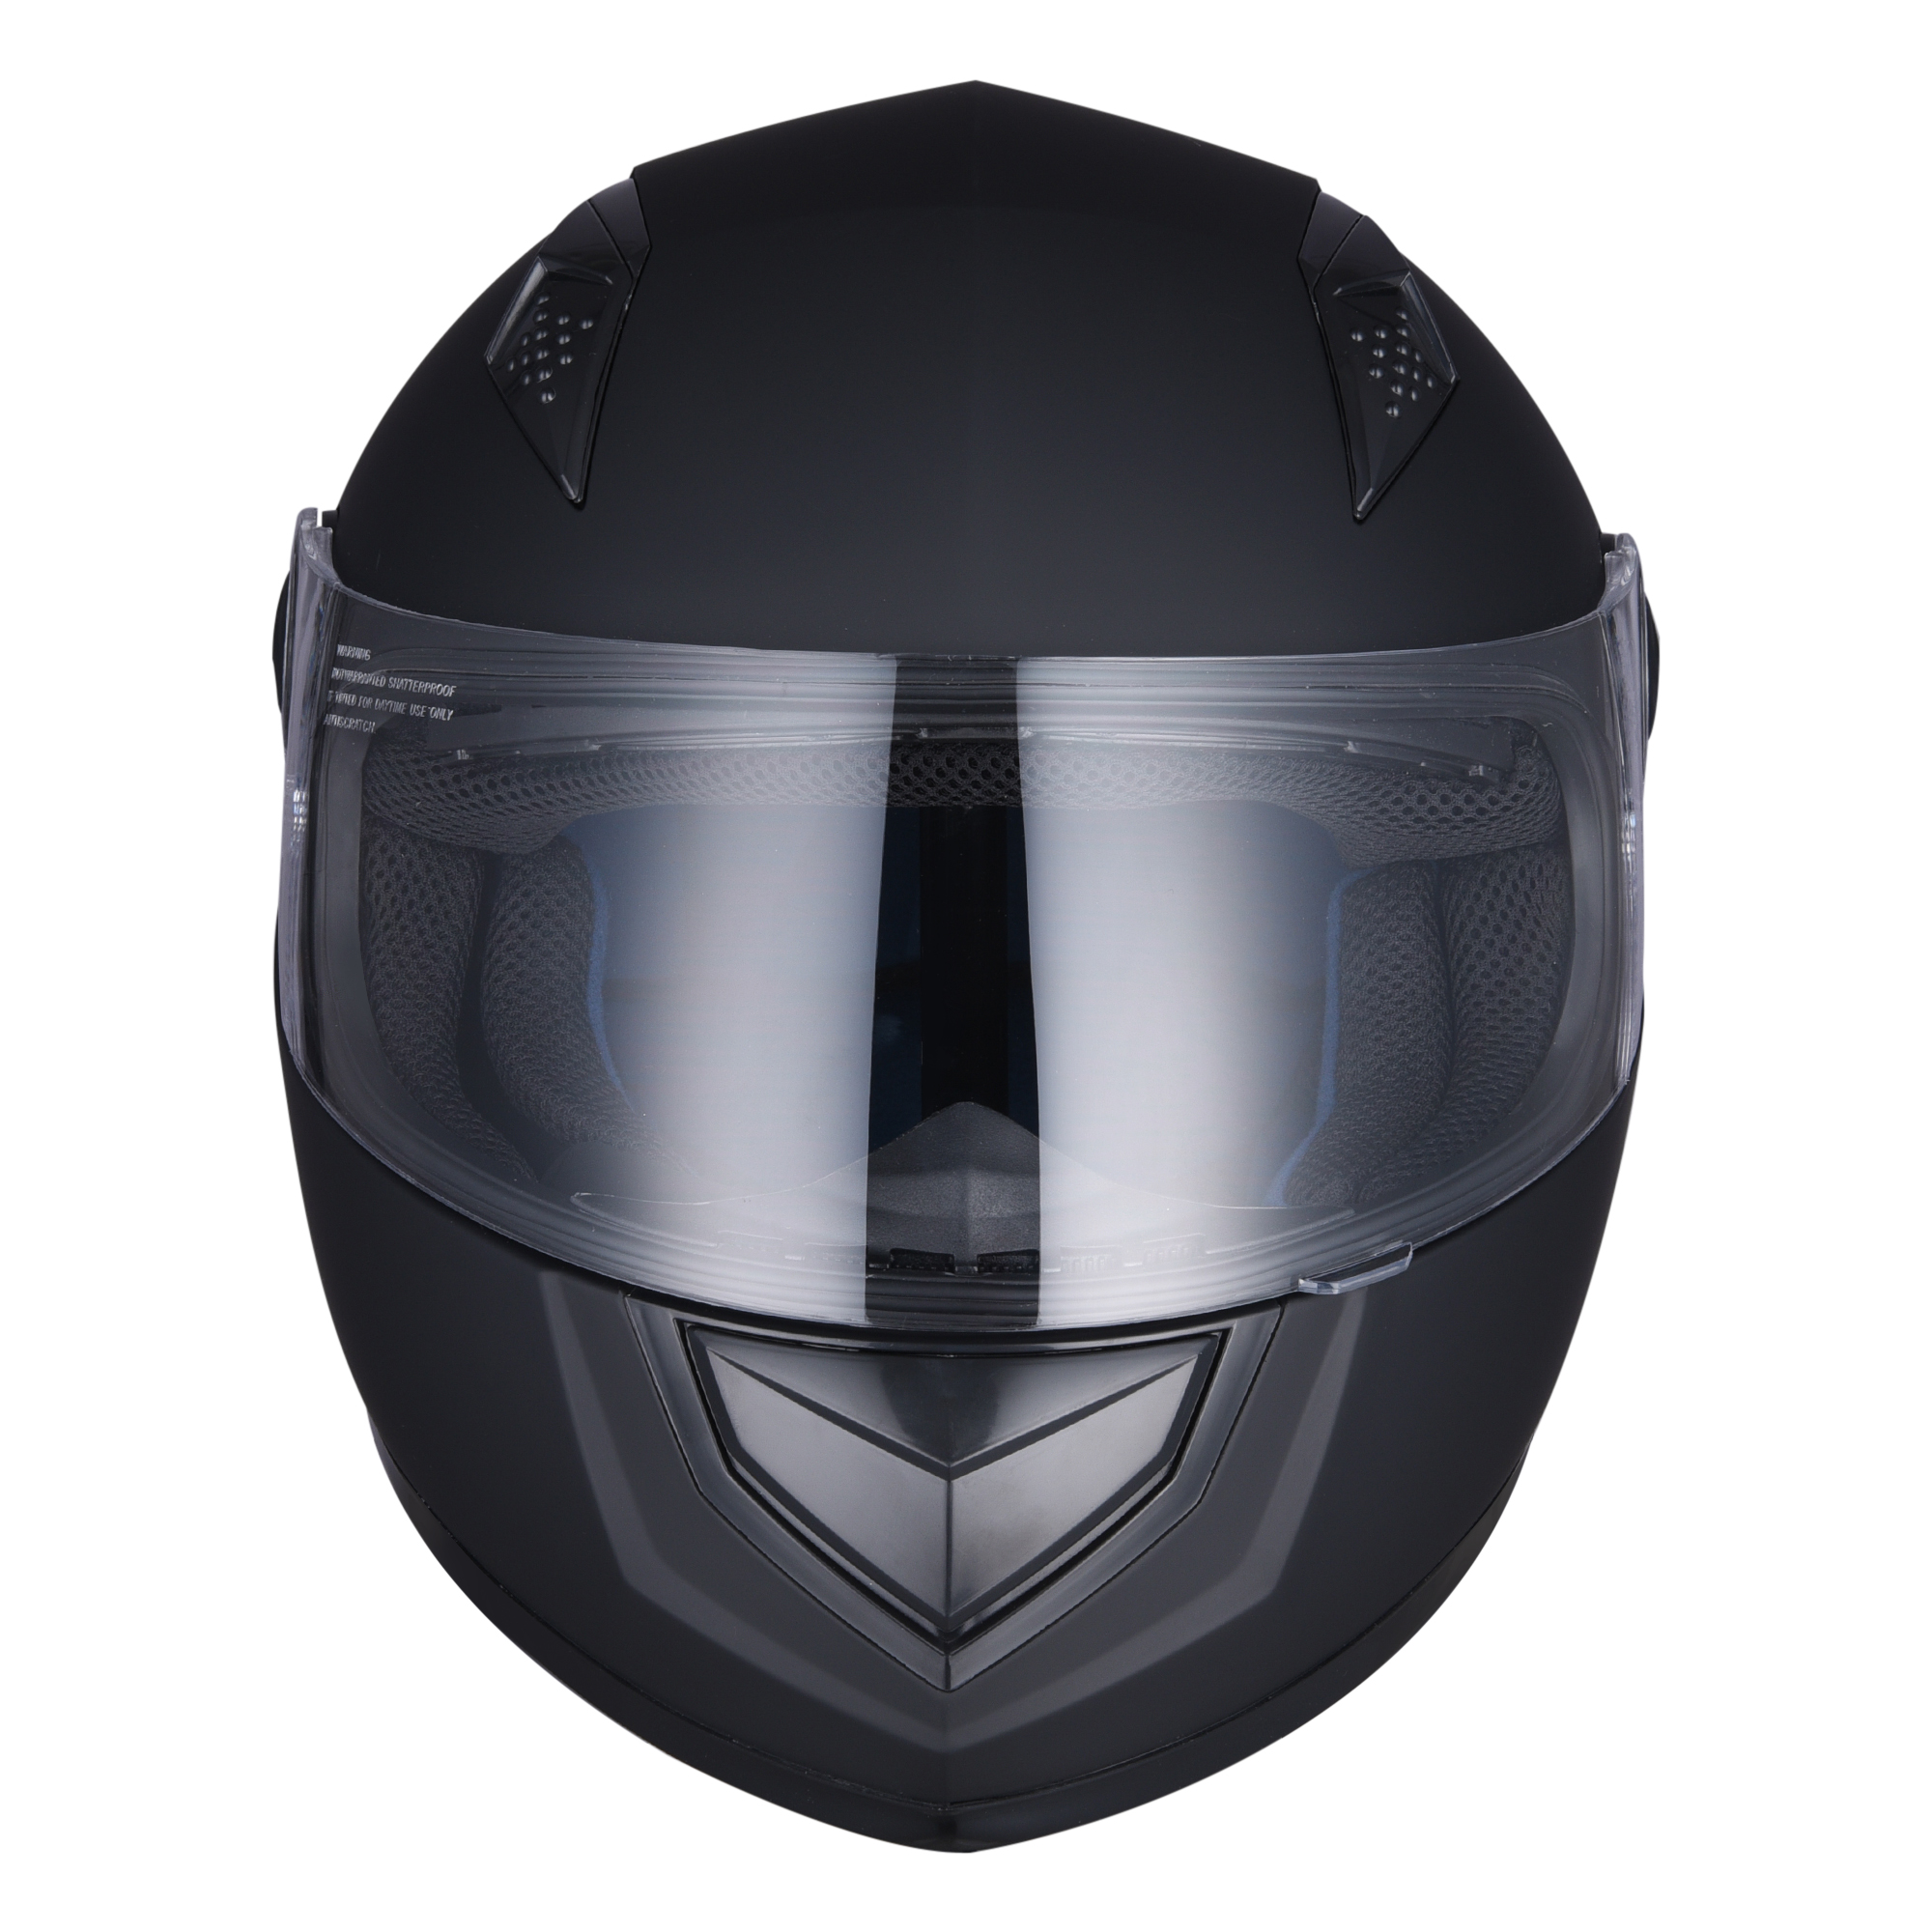 miniature 132 - AHR K12 Full Face Motorcycle Helmet DOT Air Vents Clear Visor Racing S M L XL